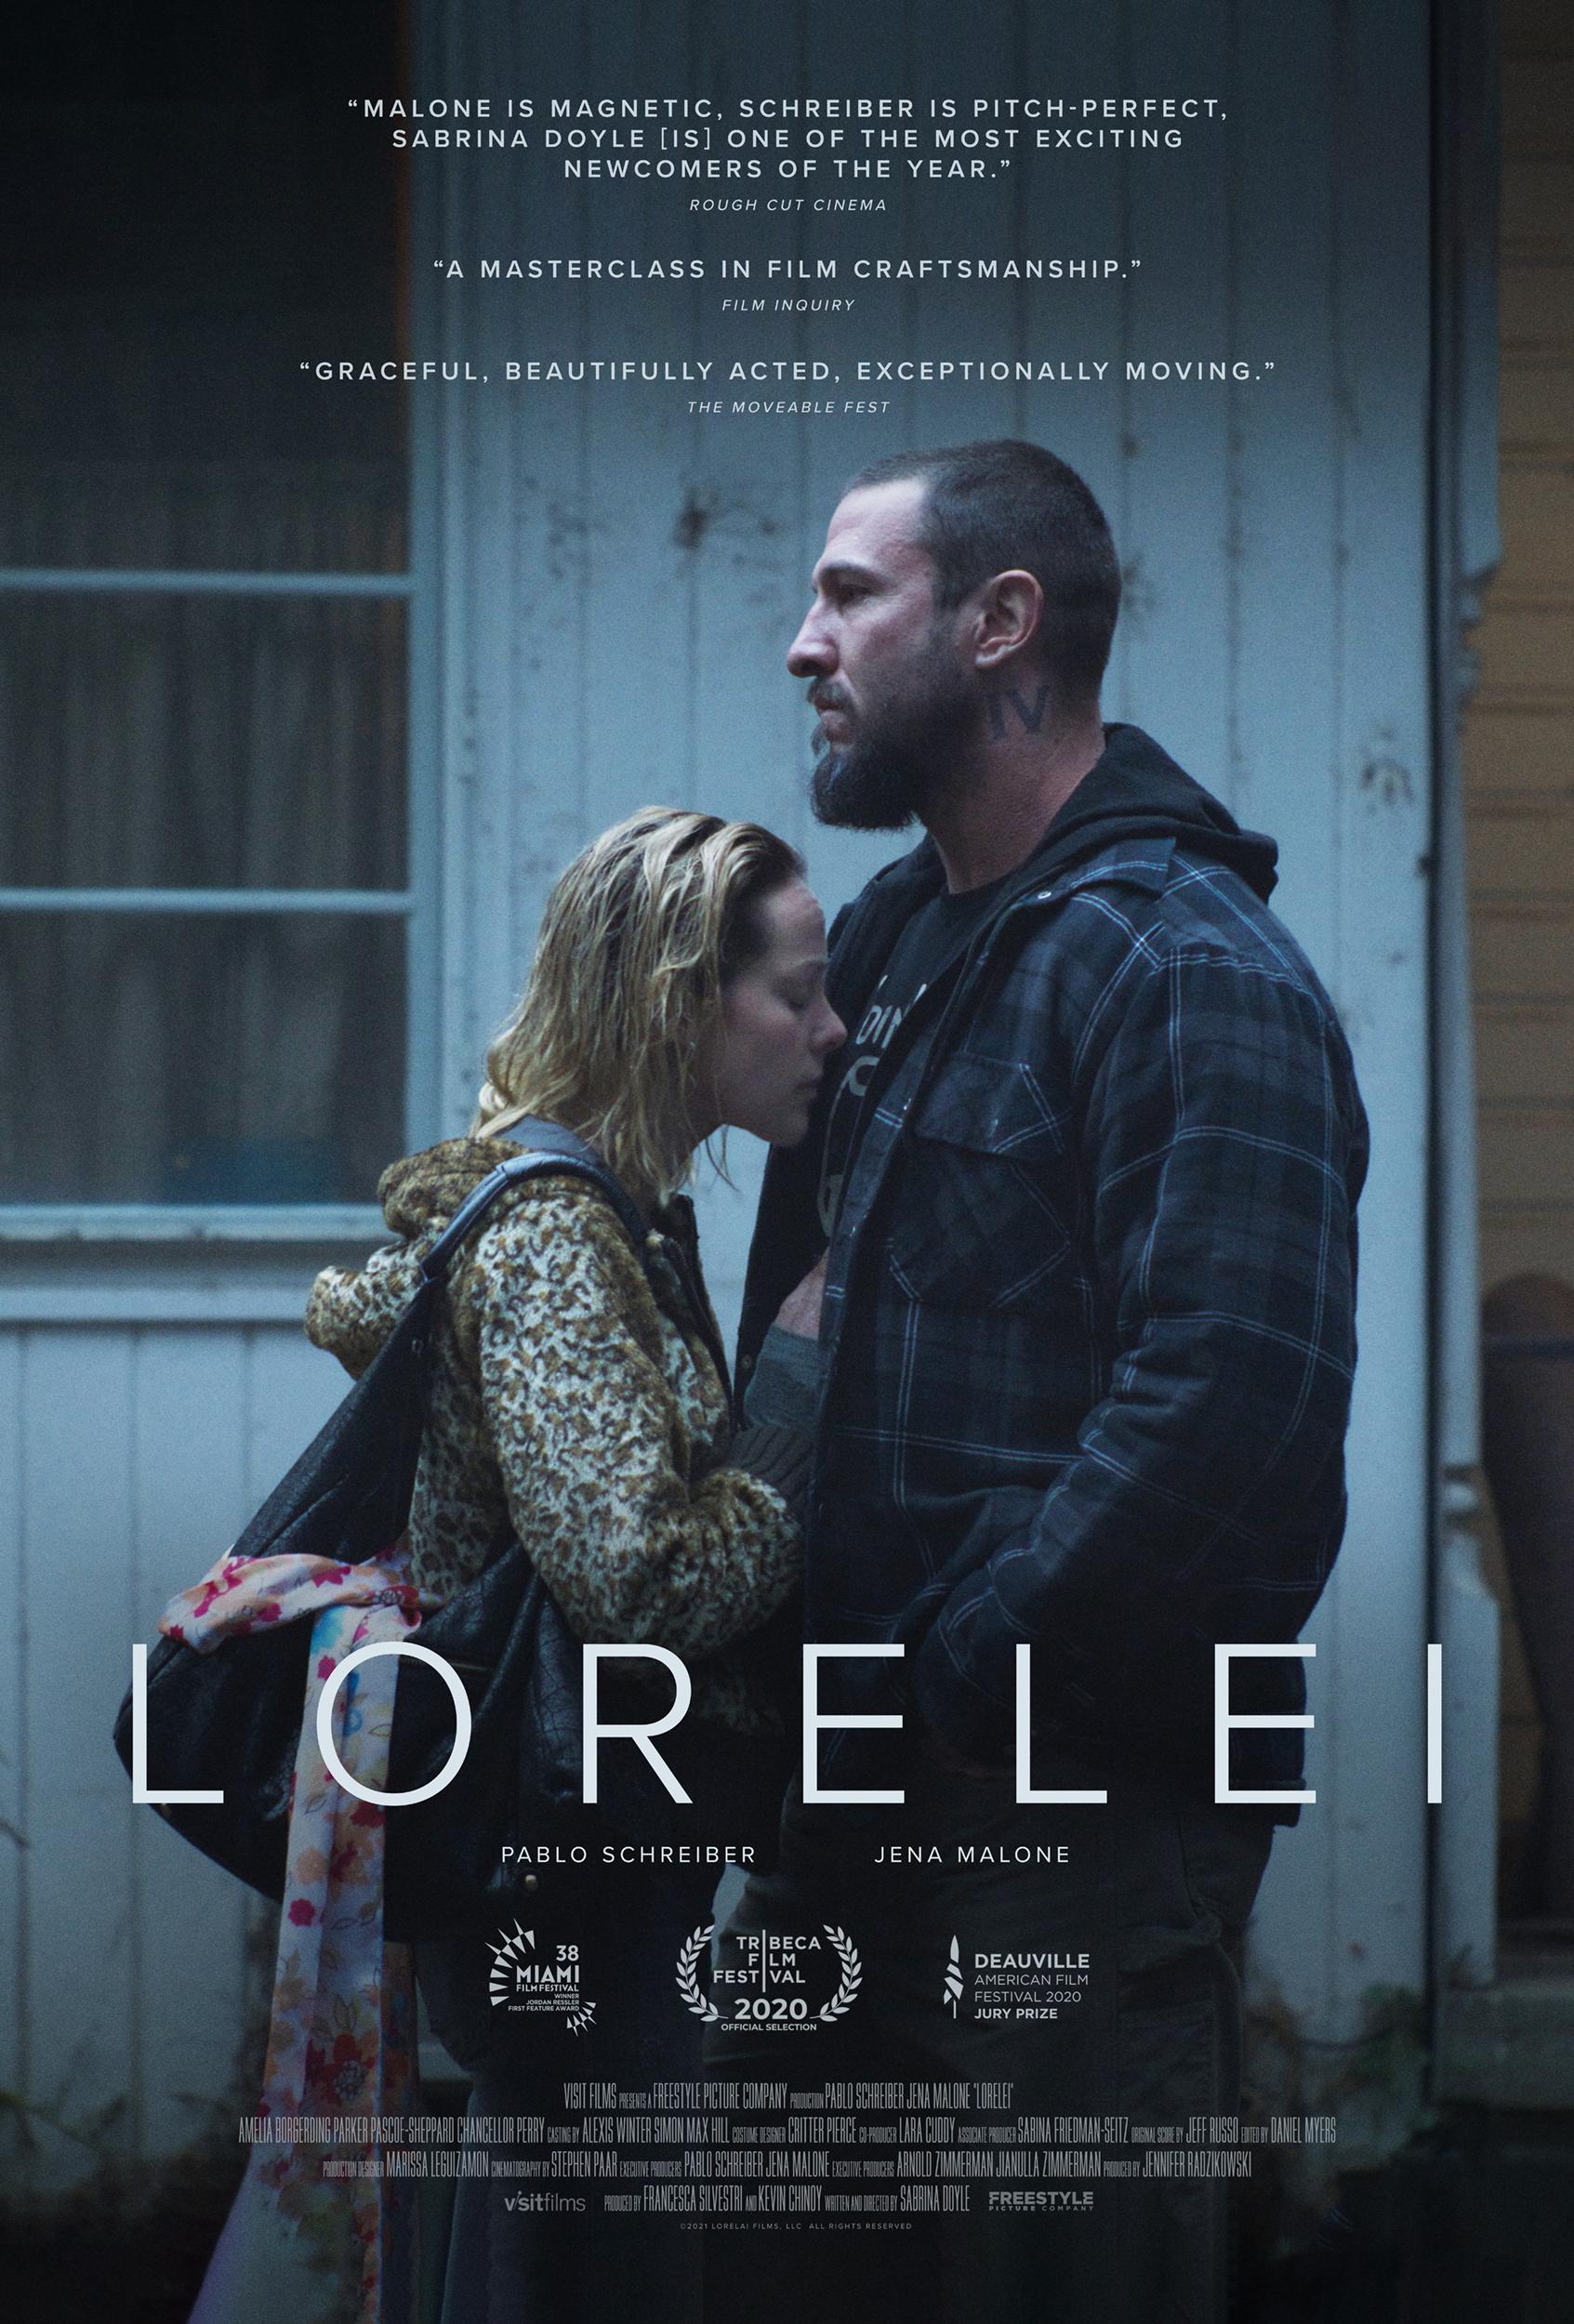 Download Lorelei (2020) WebRip 720p Full Movie [In English] With Hindi Subtitles Full Movie Online On 1xcinema.com